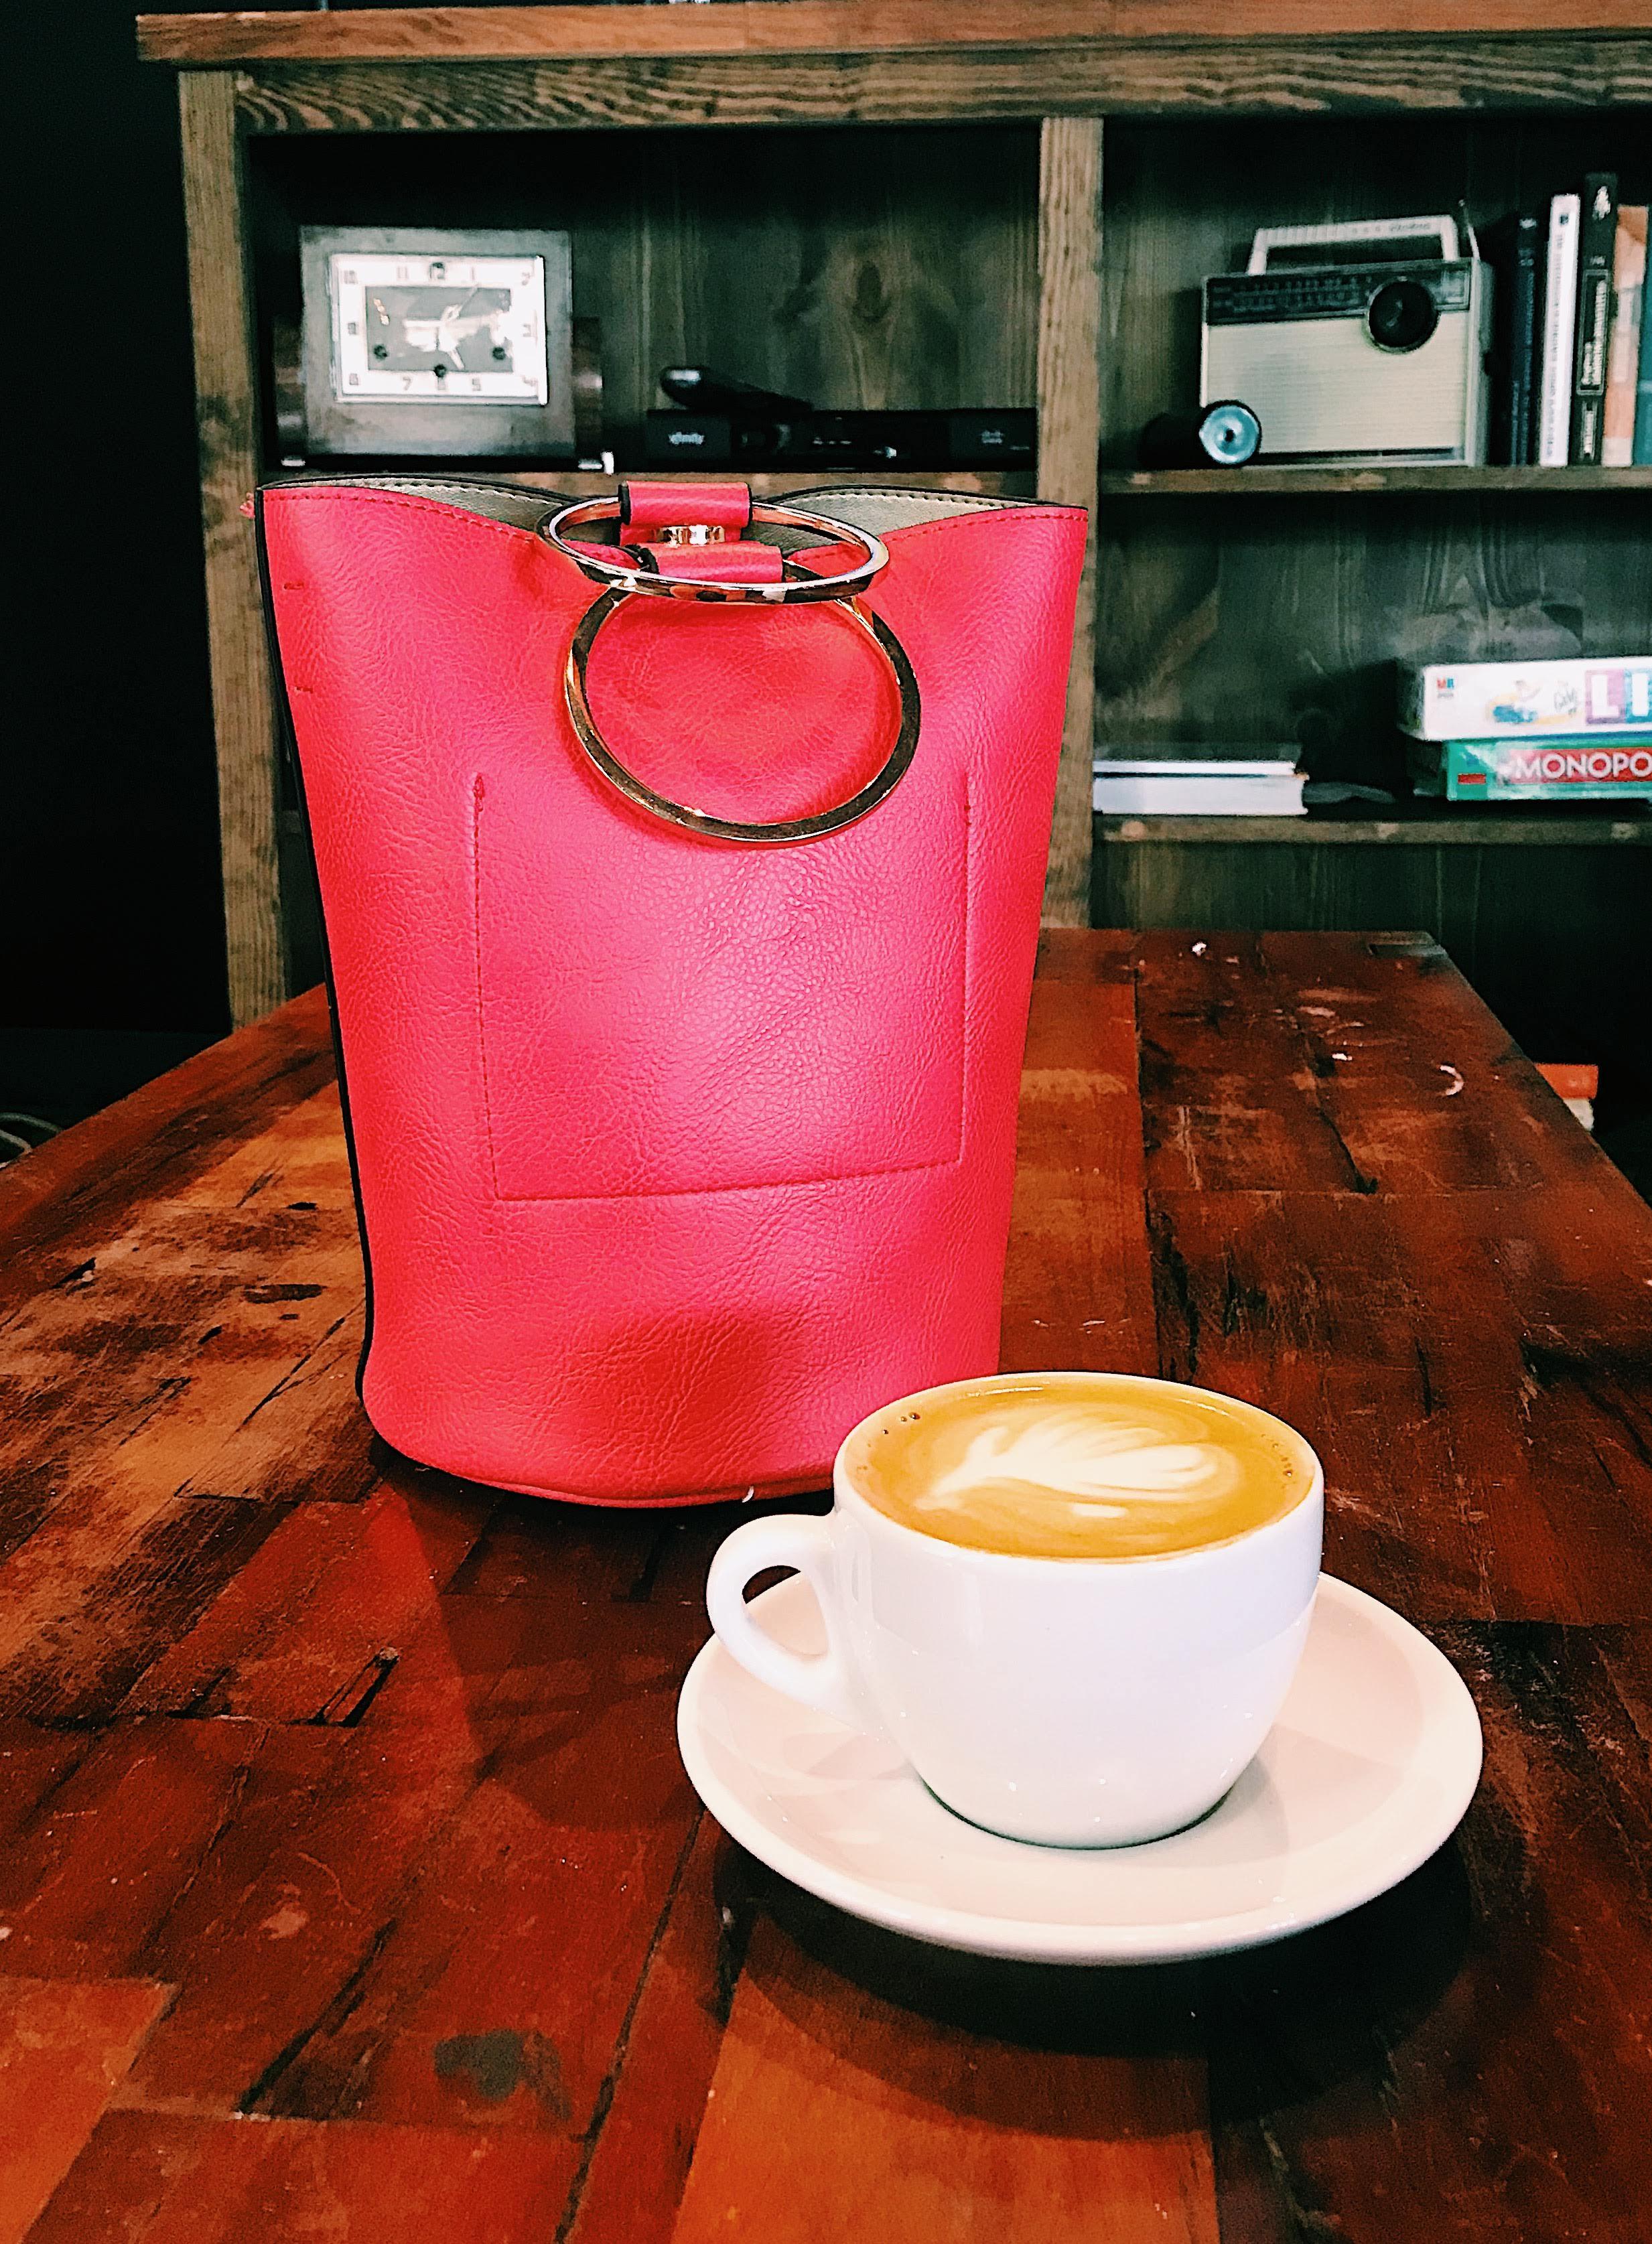 Three Heel Clicks - Siphon Coffee and Cozy Poncho - Houston Hotspots (7).jpg